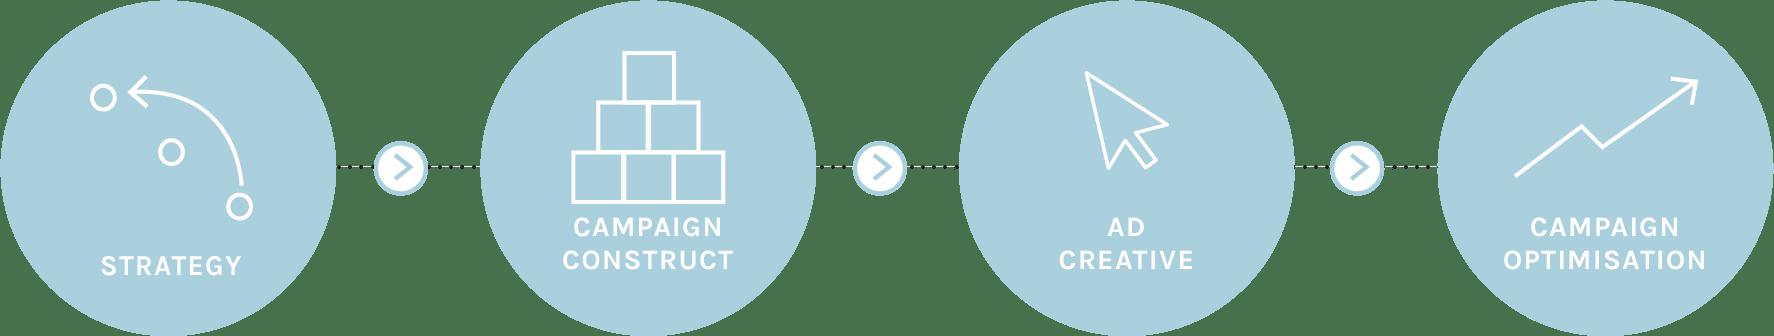 Google Ads - Bamler Agency Approach & Implementation